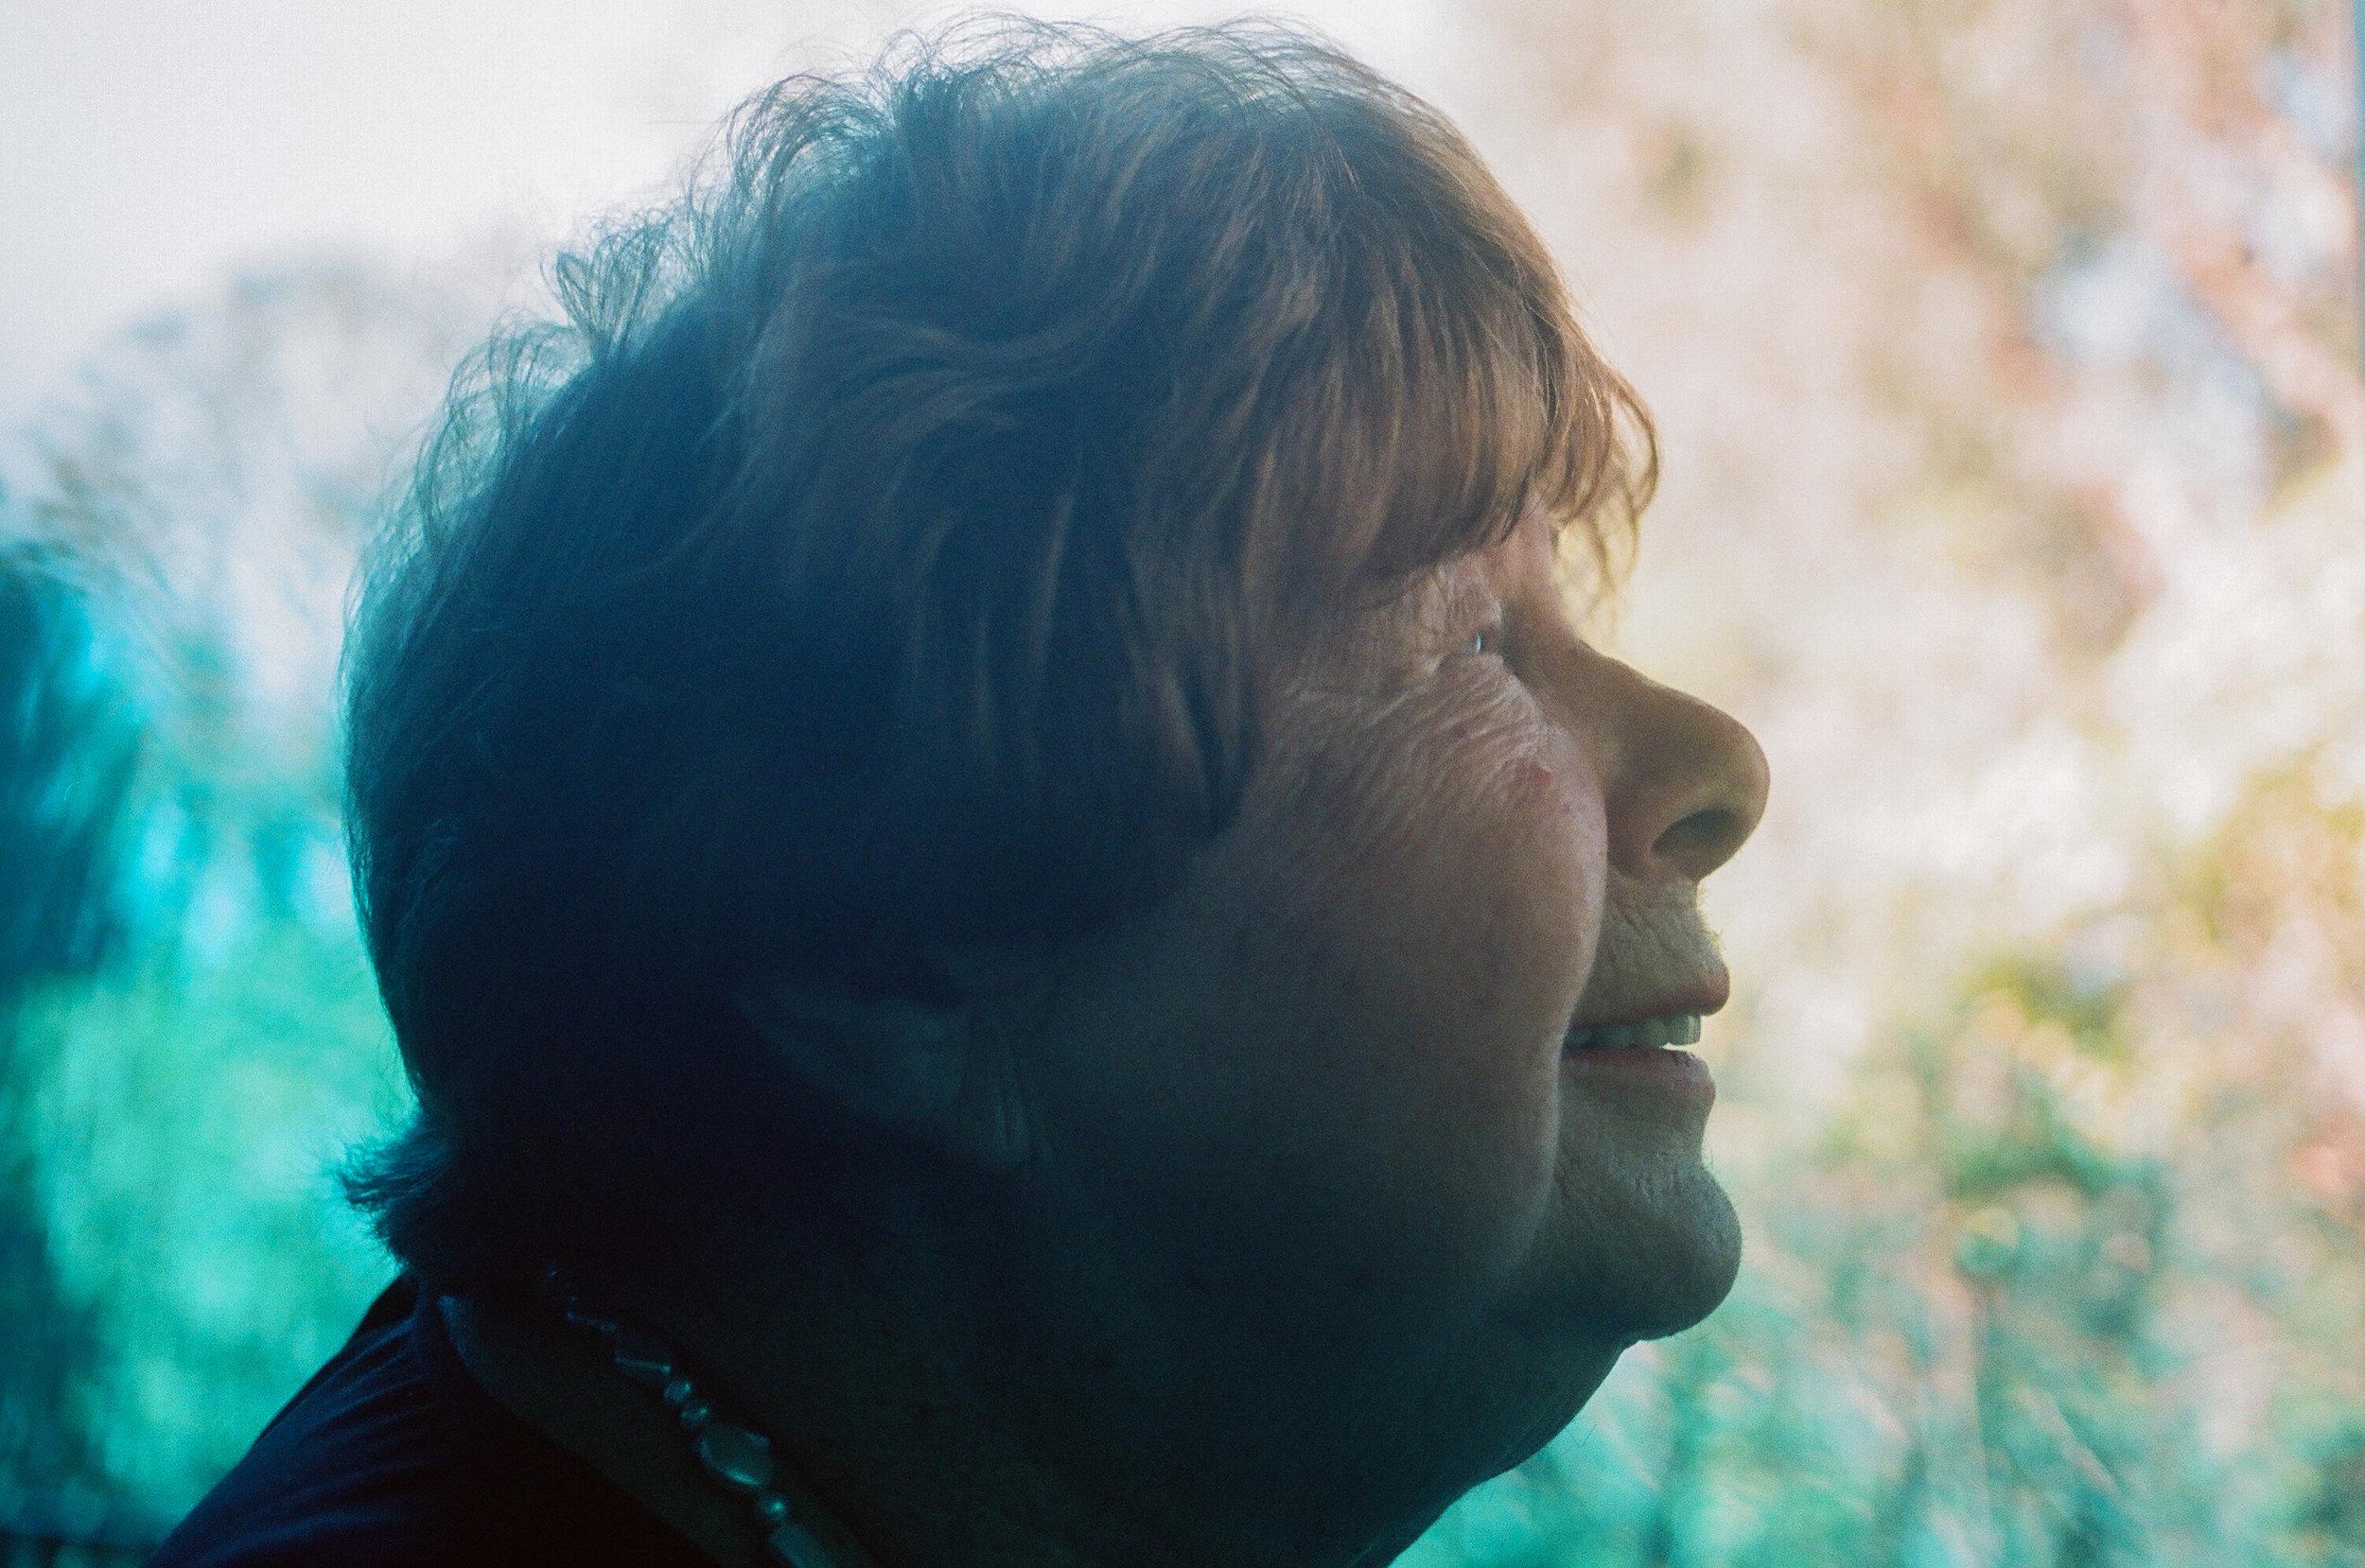 Marjorie Perloff for Tablet Magazine